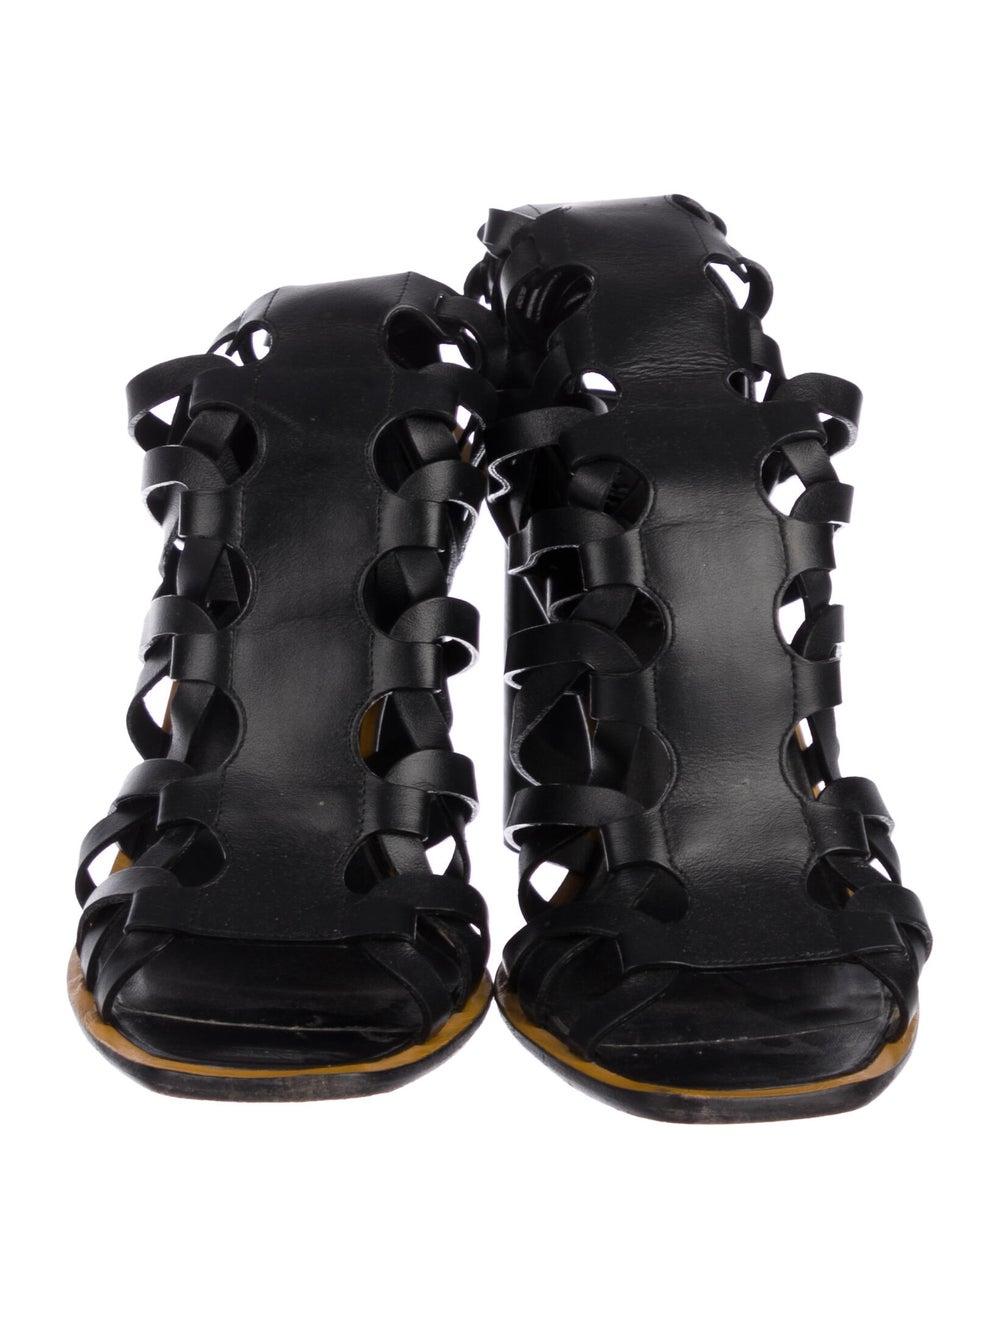 Altuzarra Caged Lace-Up Sandals Black - image 3